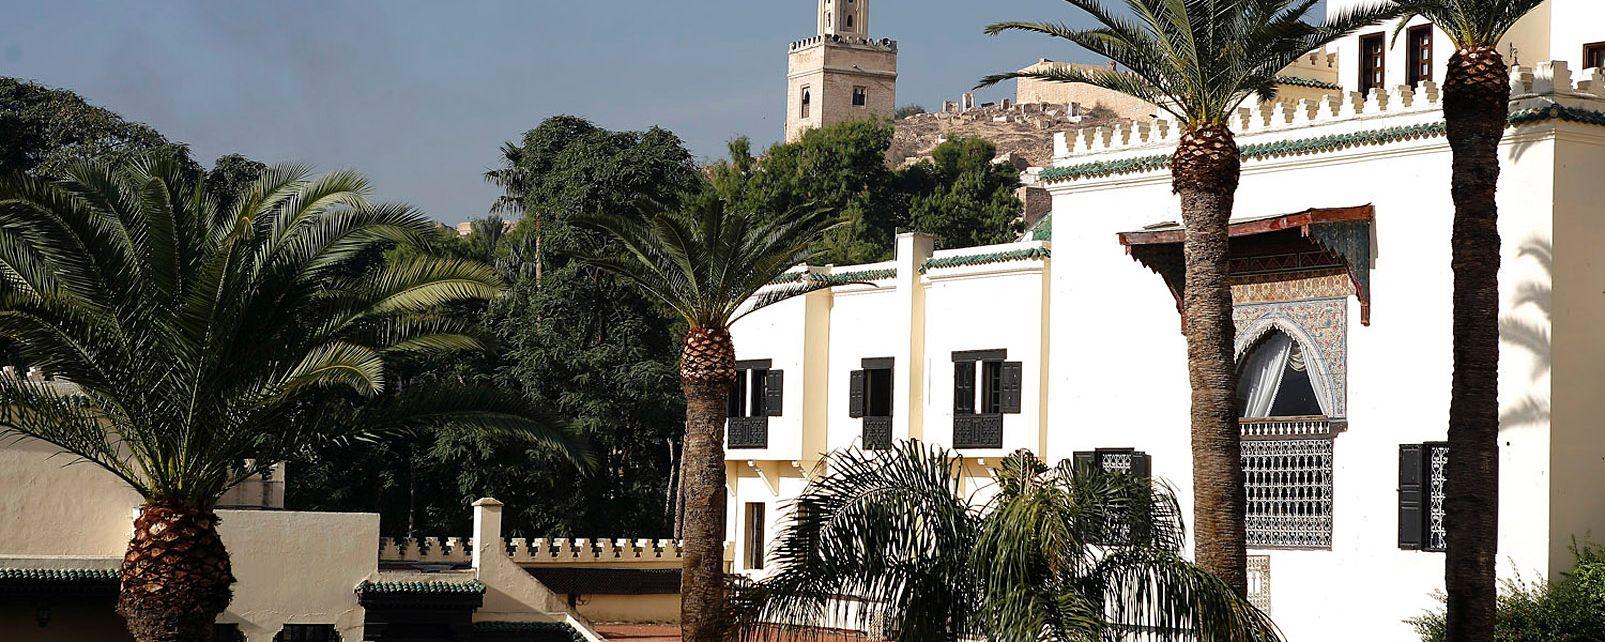 Hotel Sofitel Palais Jamai